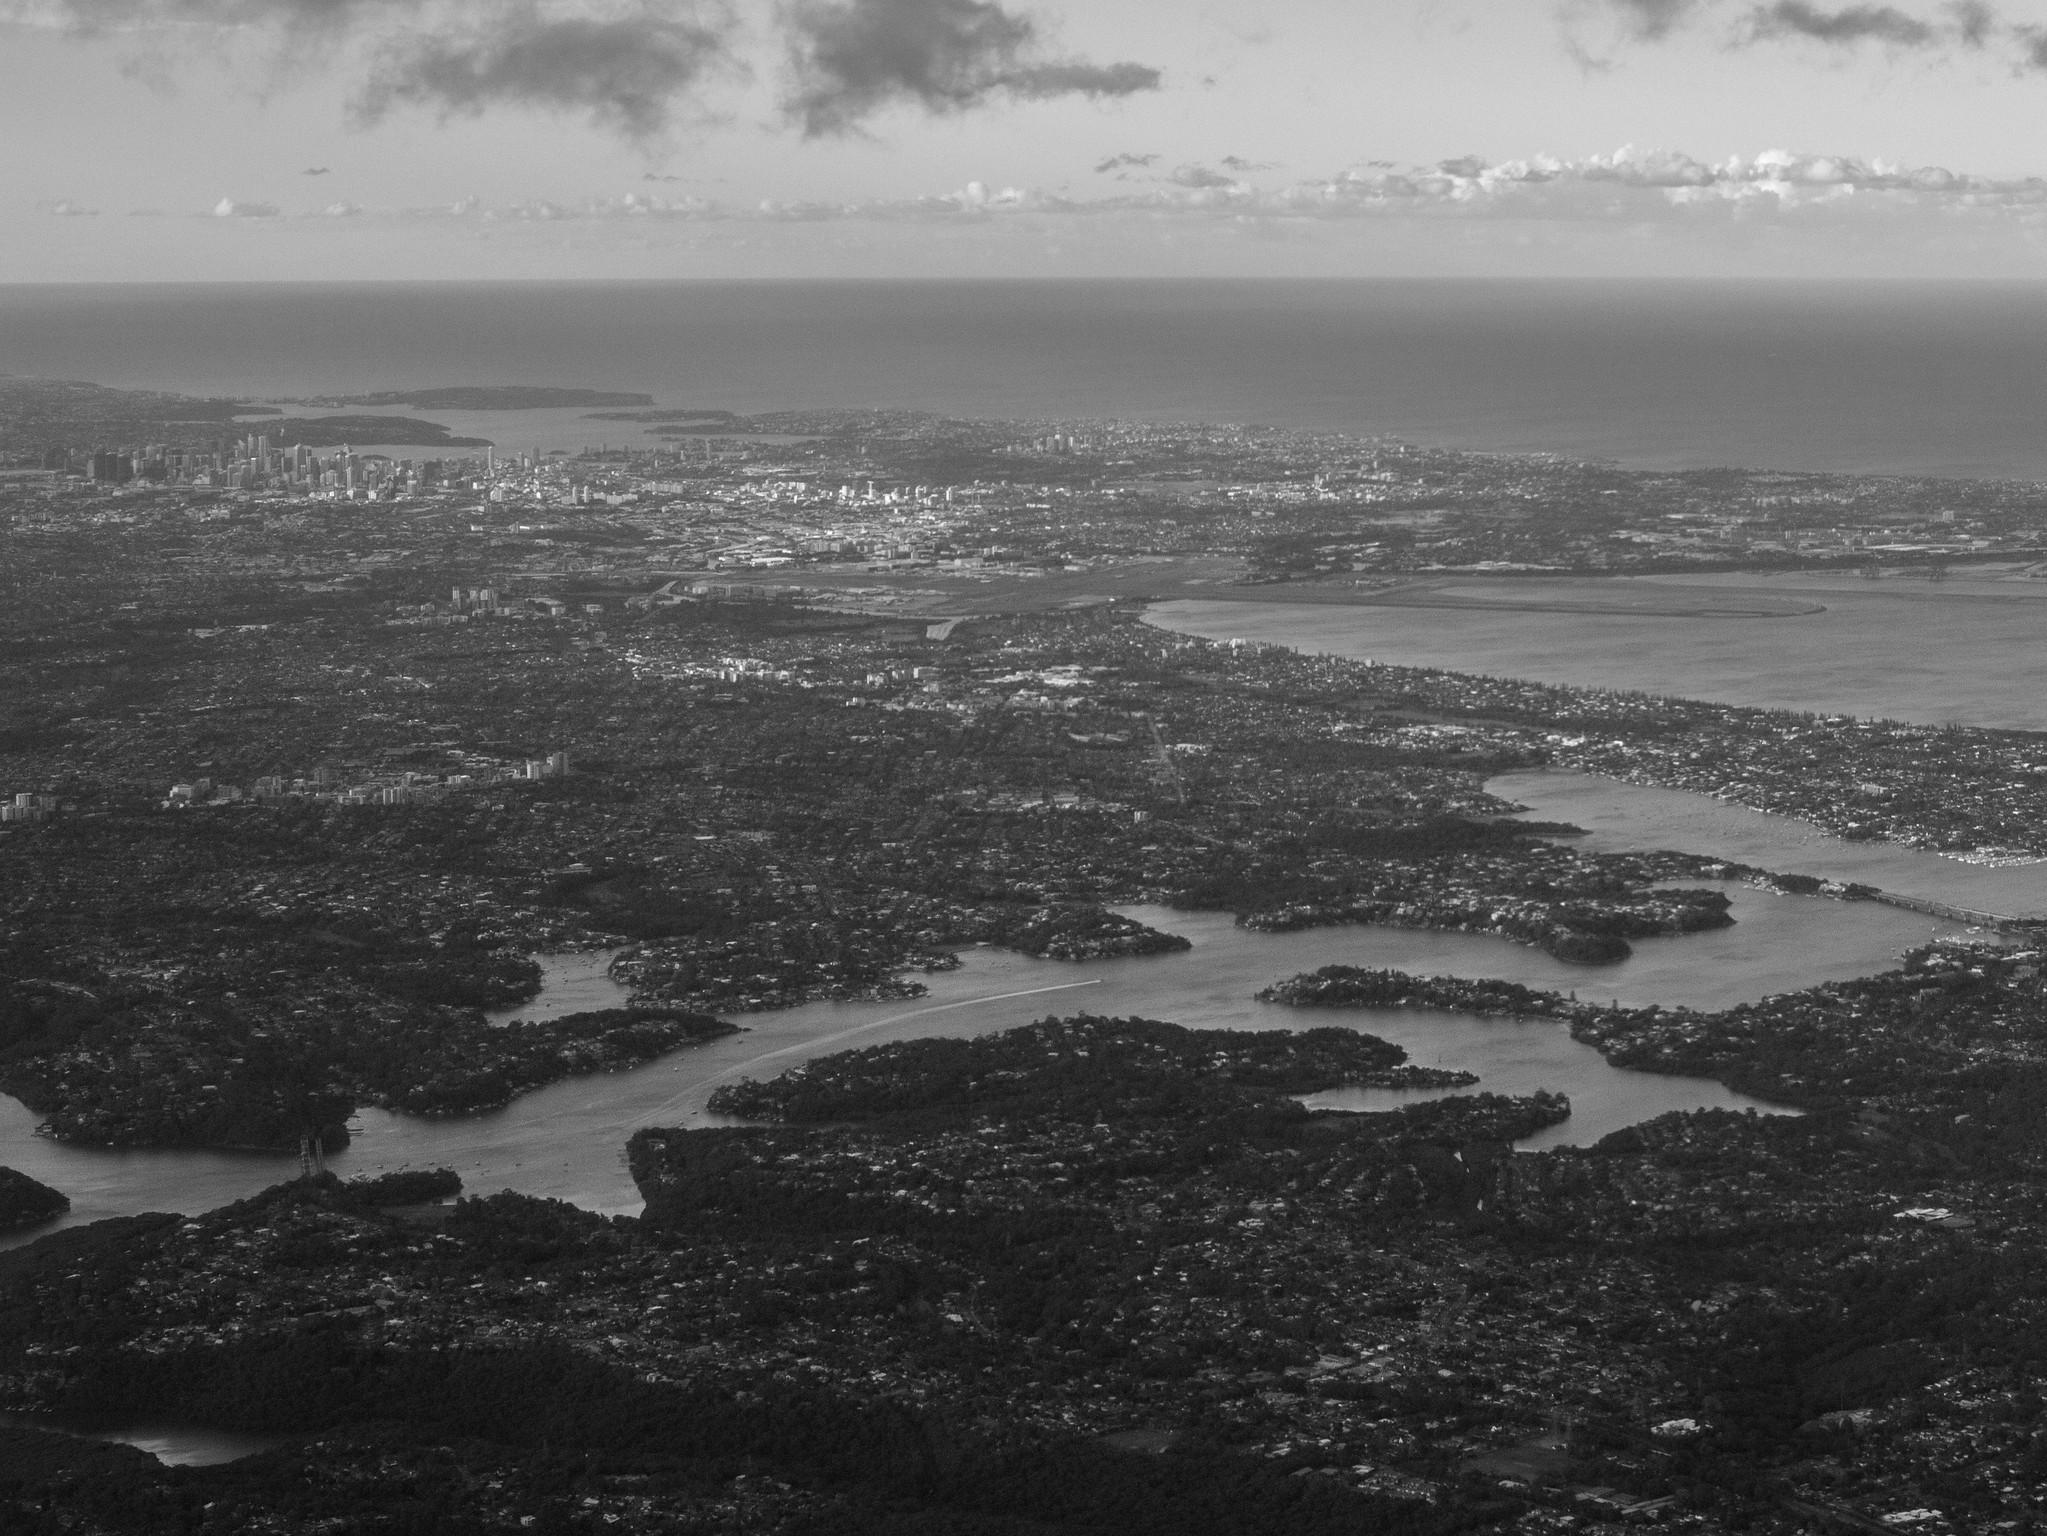 Sydney to the Left